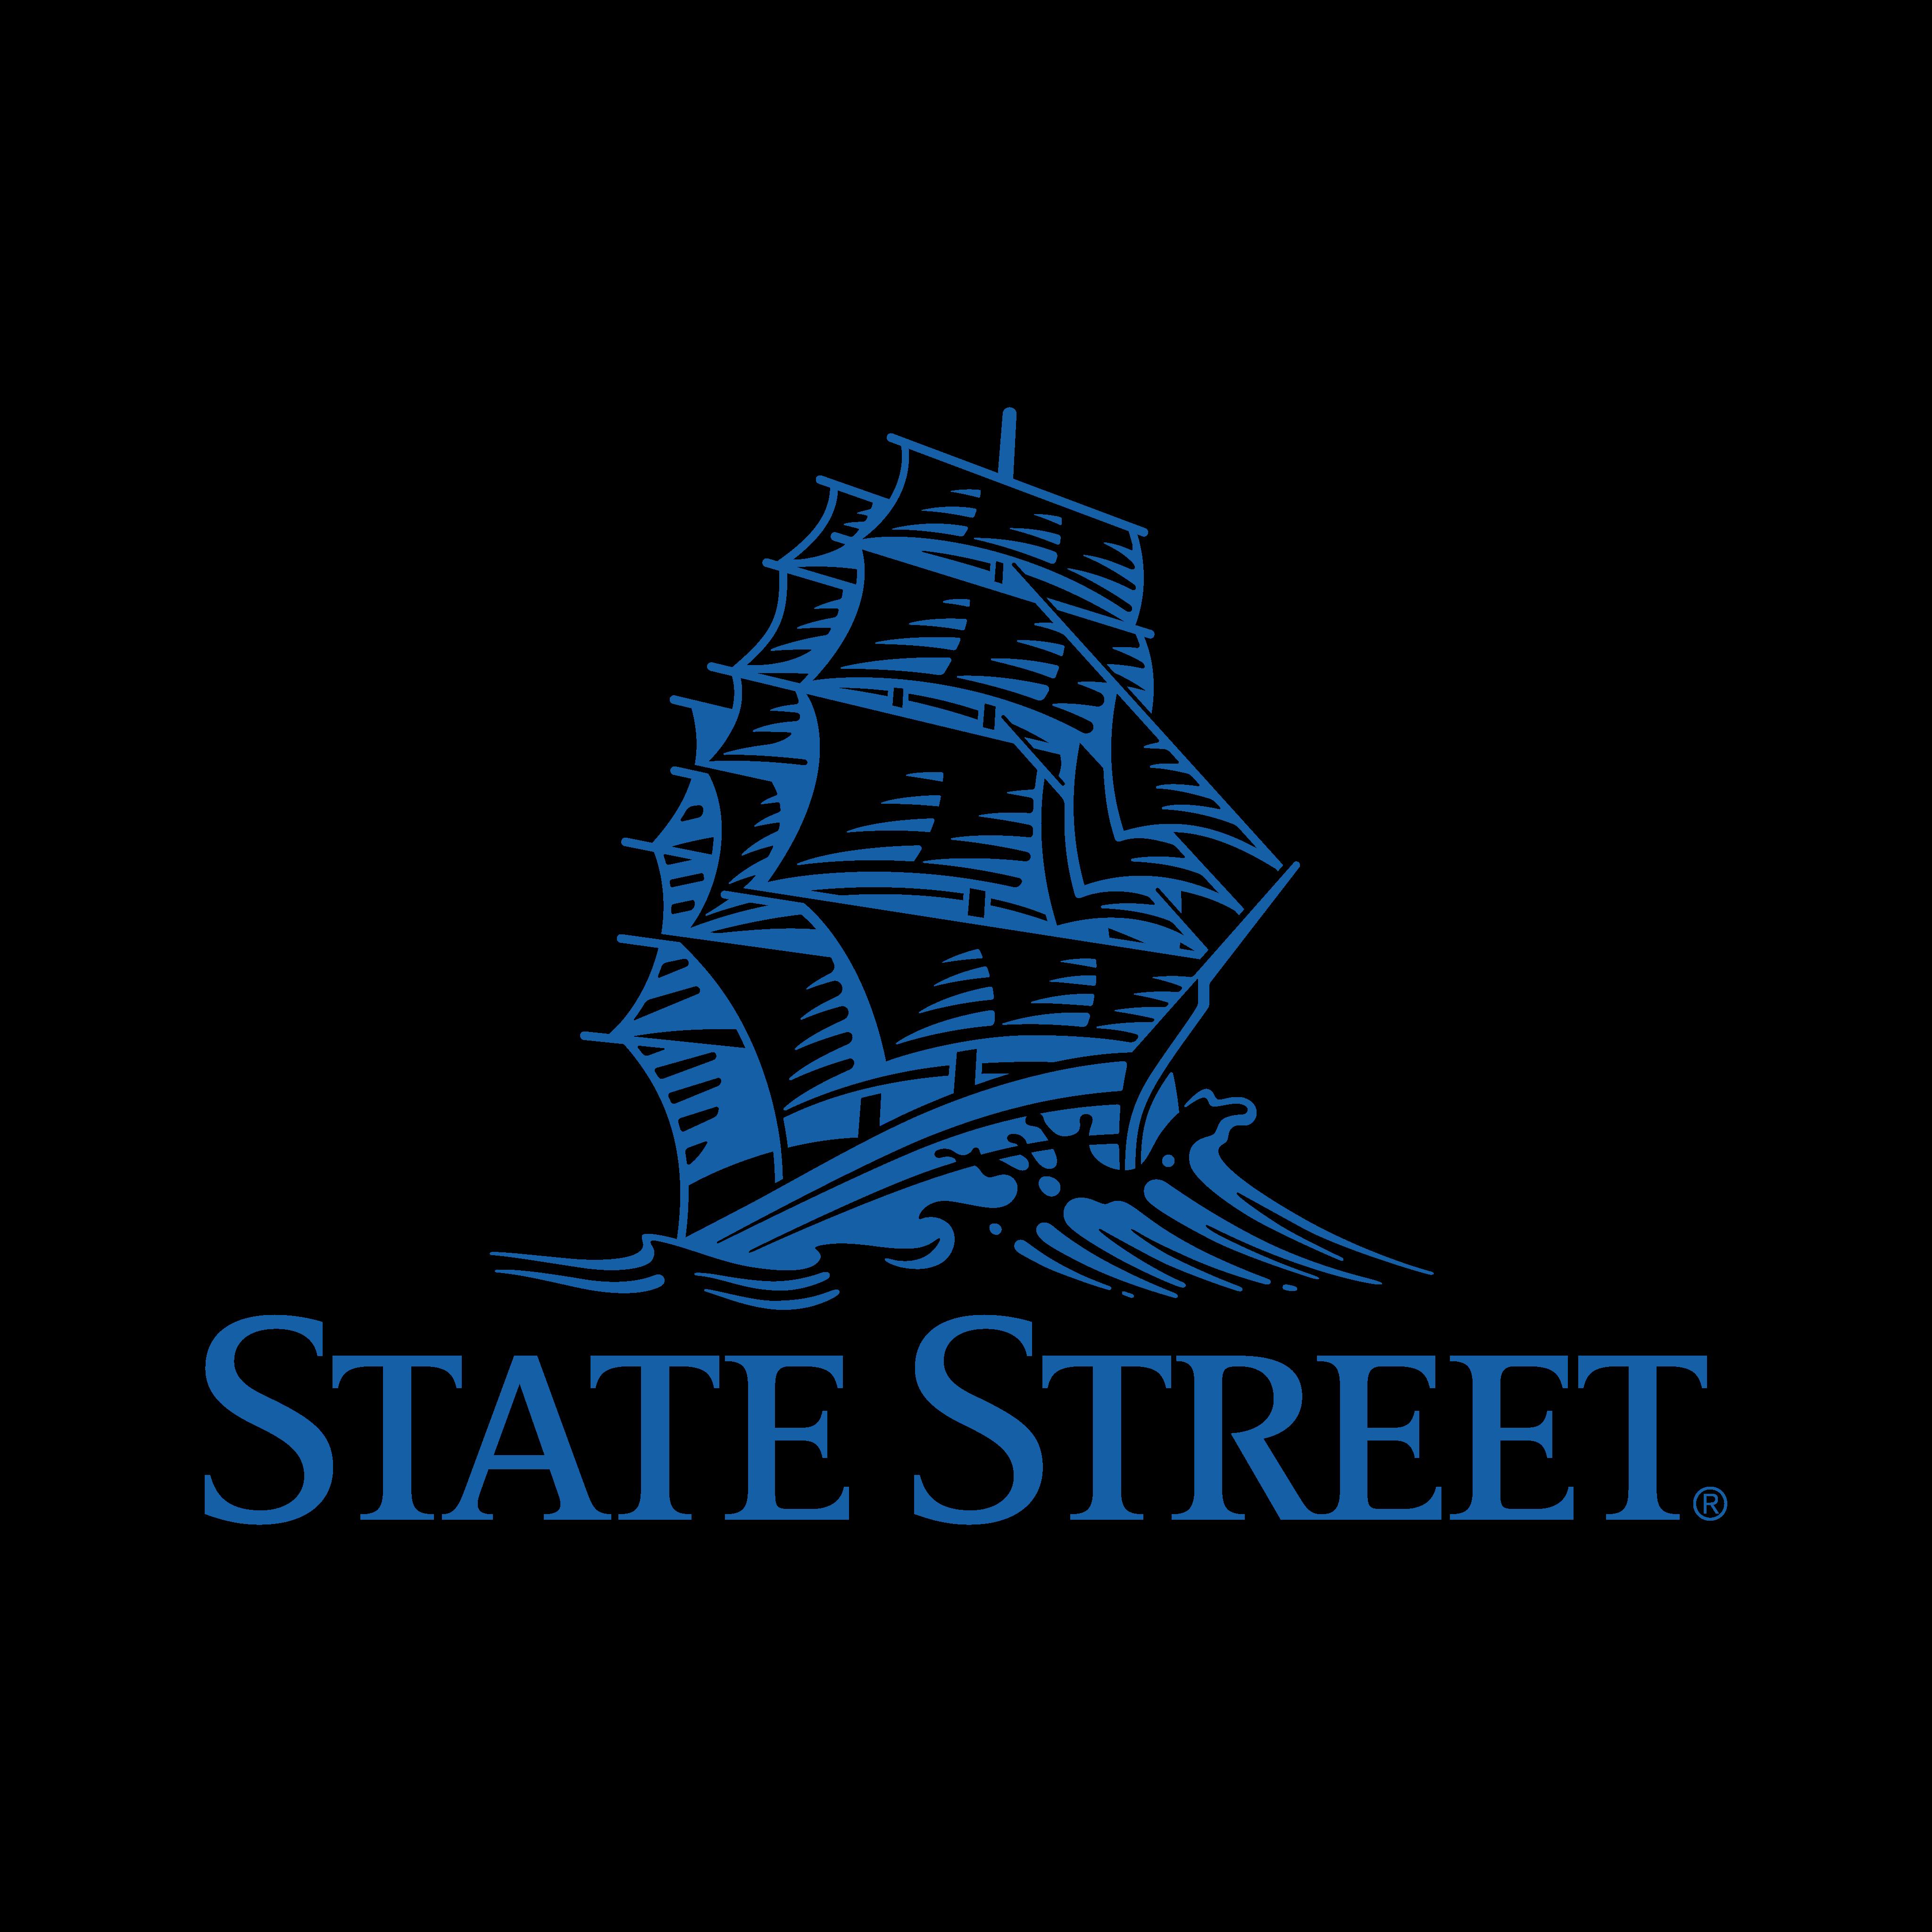 state street logo 0 - State Street Corporation Logo